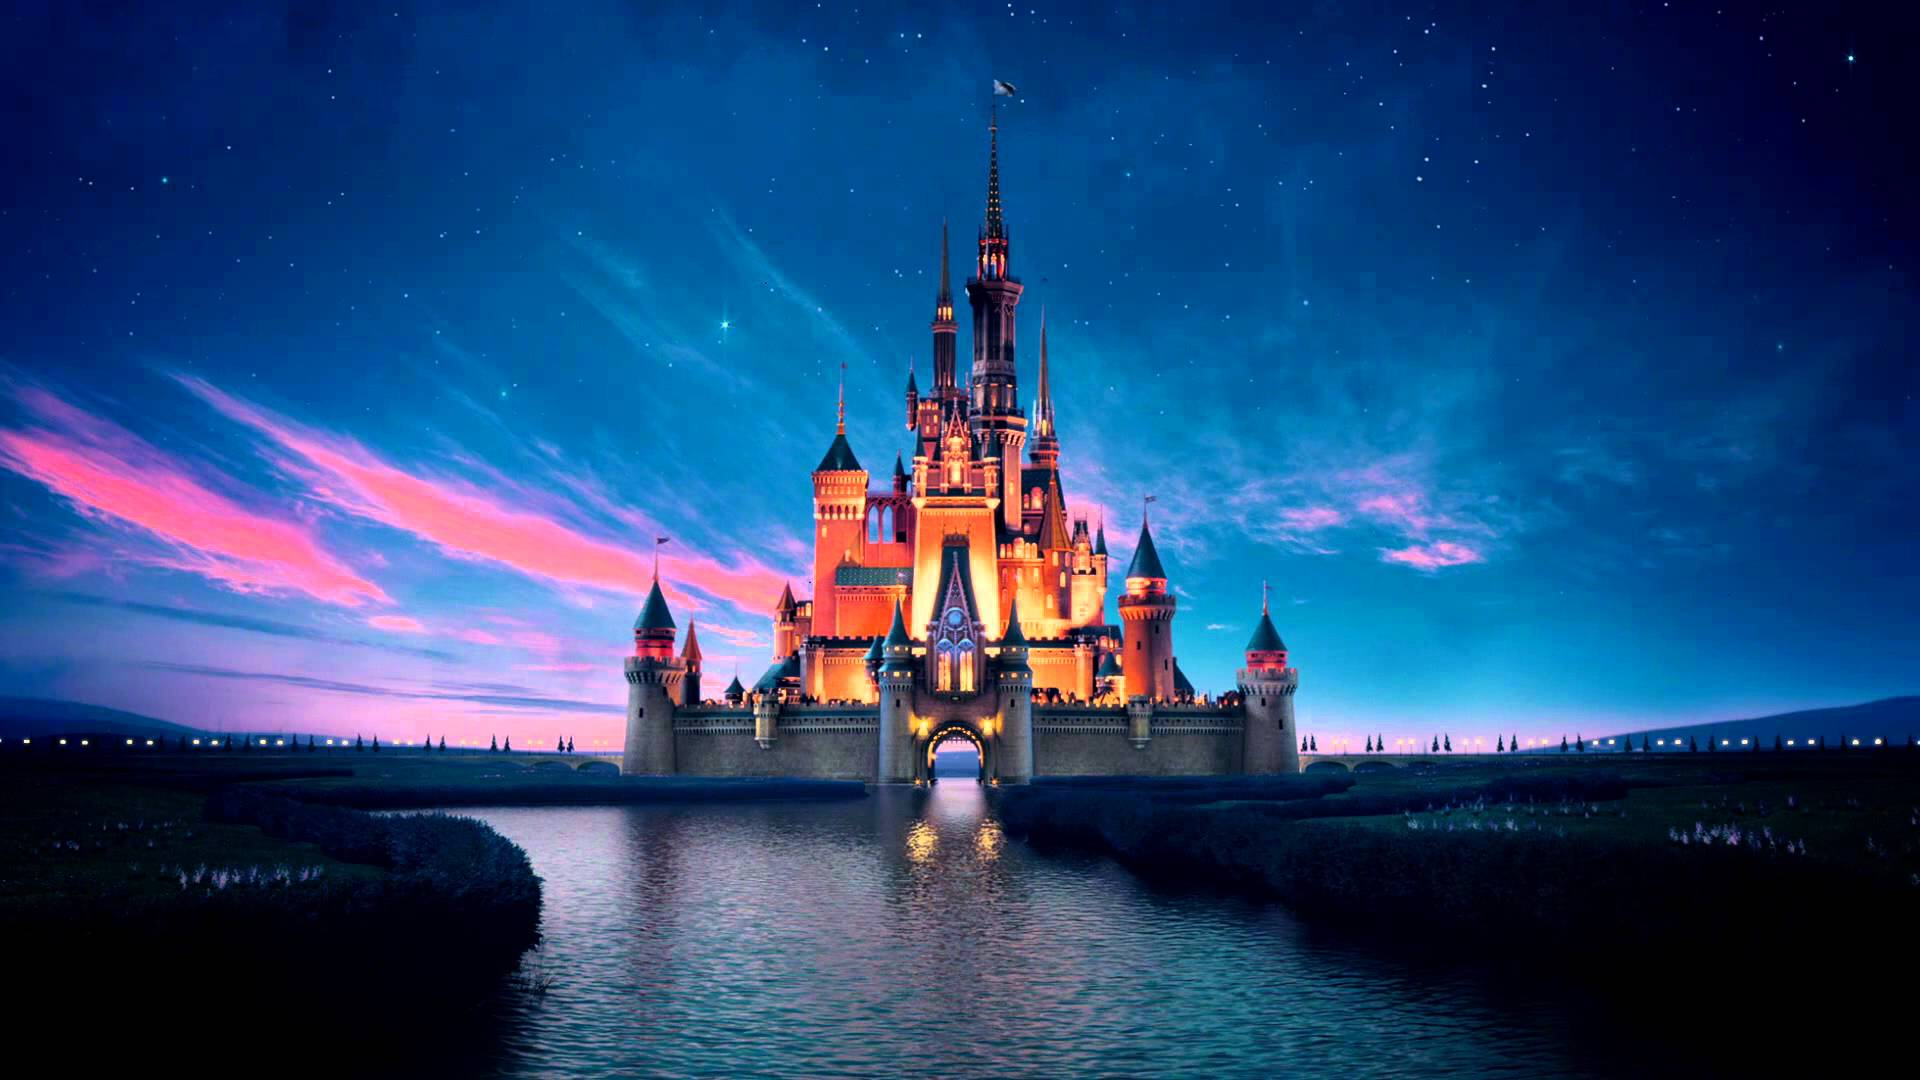 cinderella castle widescreen wallpaper - photo #23